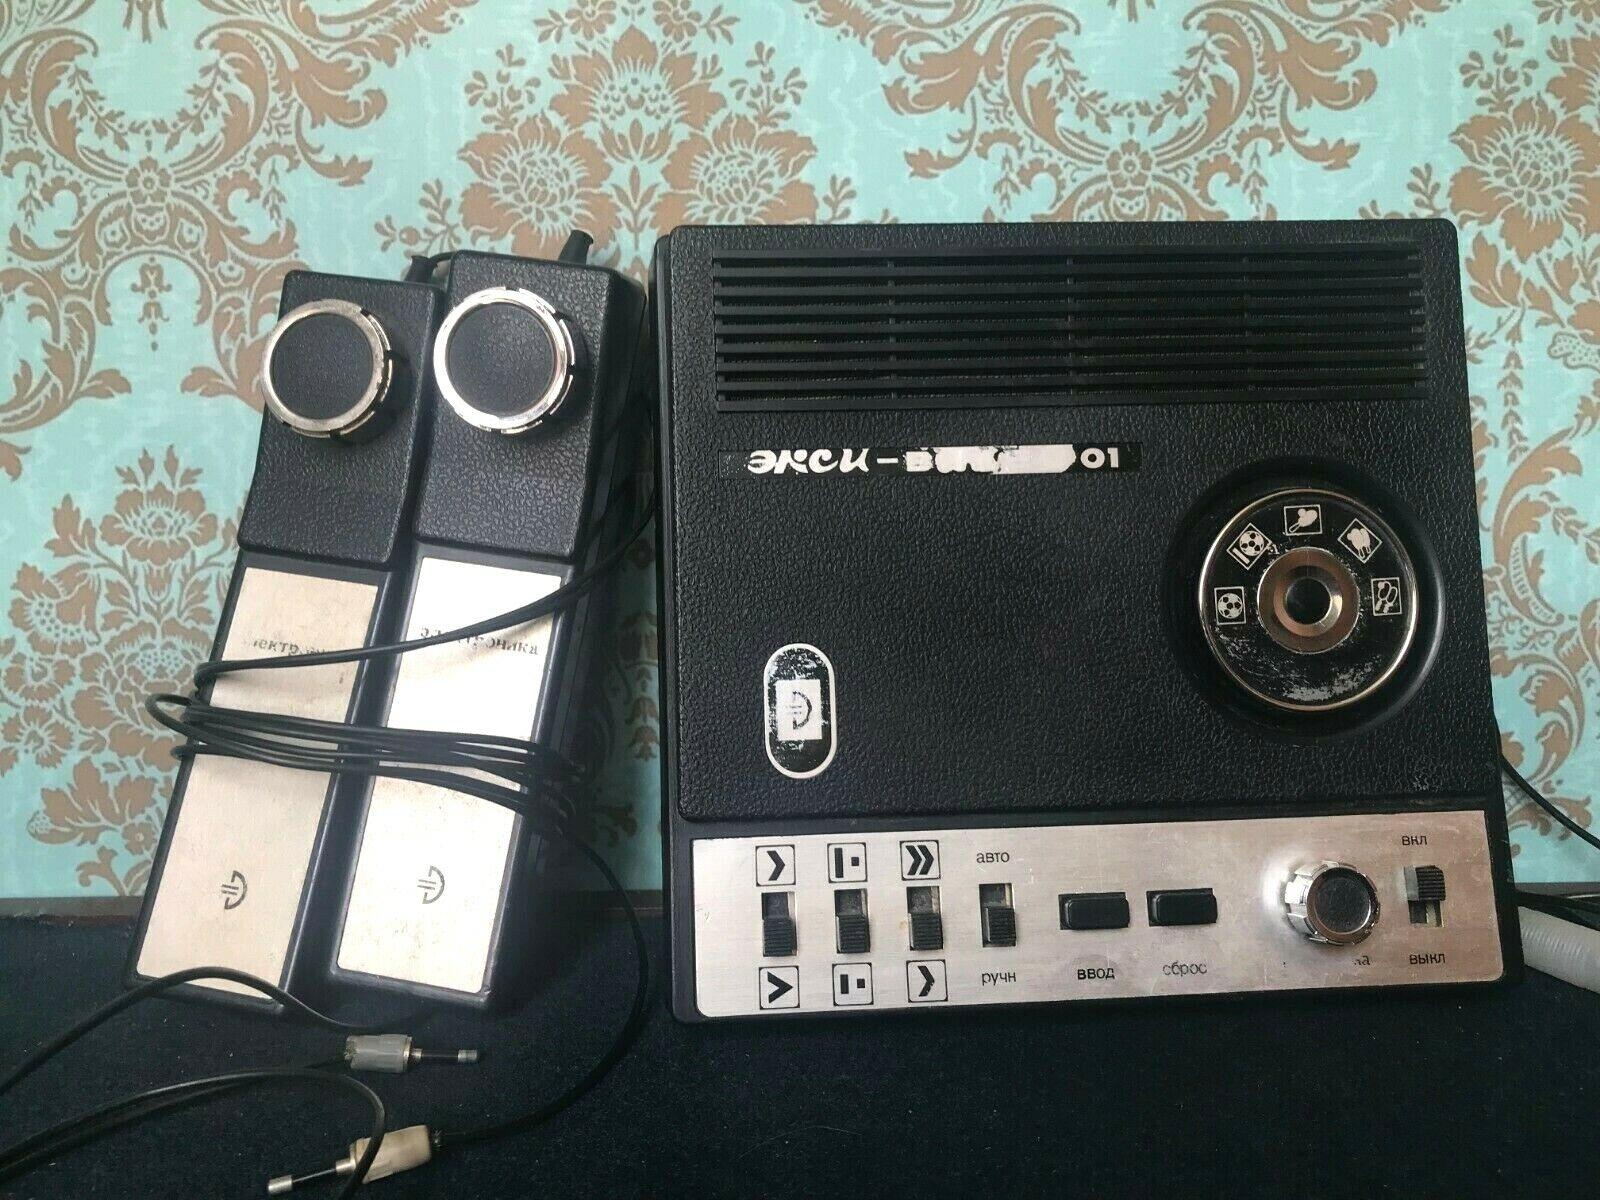 Elektronika Eksi video consola URSS Soviética Vintage